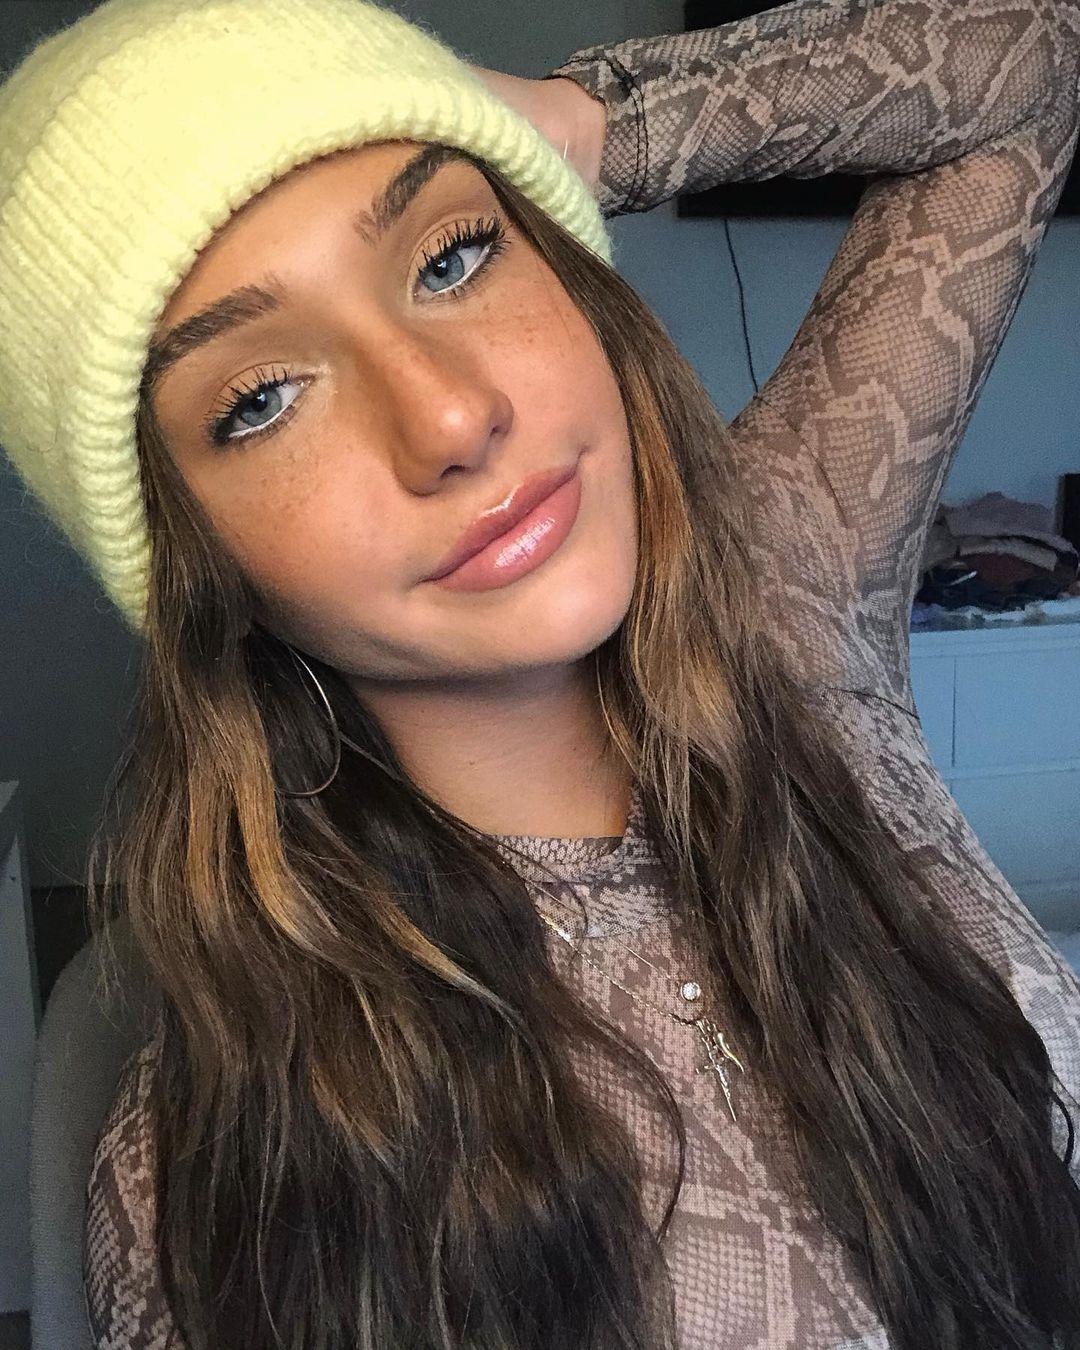 Olivia-Mogan-Wallpapers-Insta-Fit-Bio-19